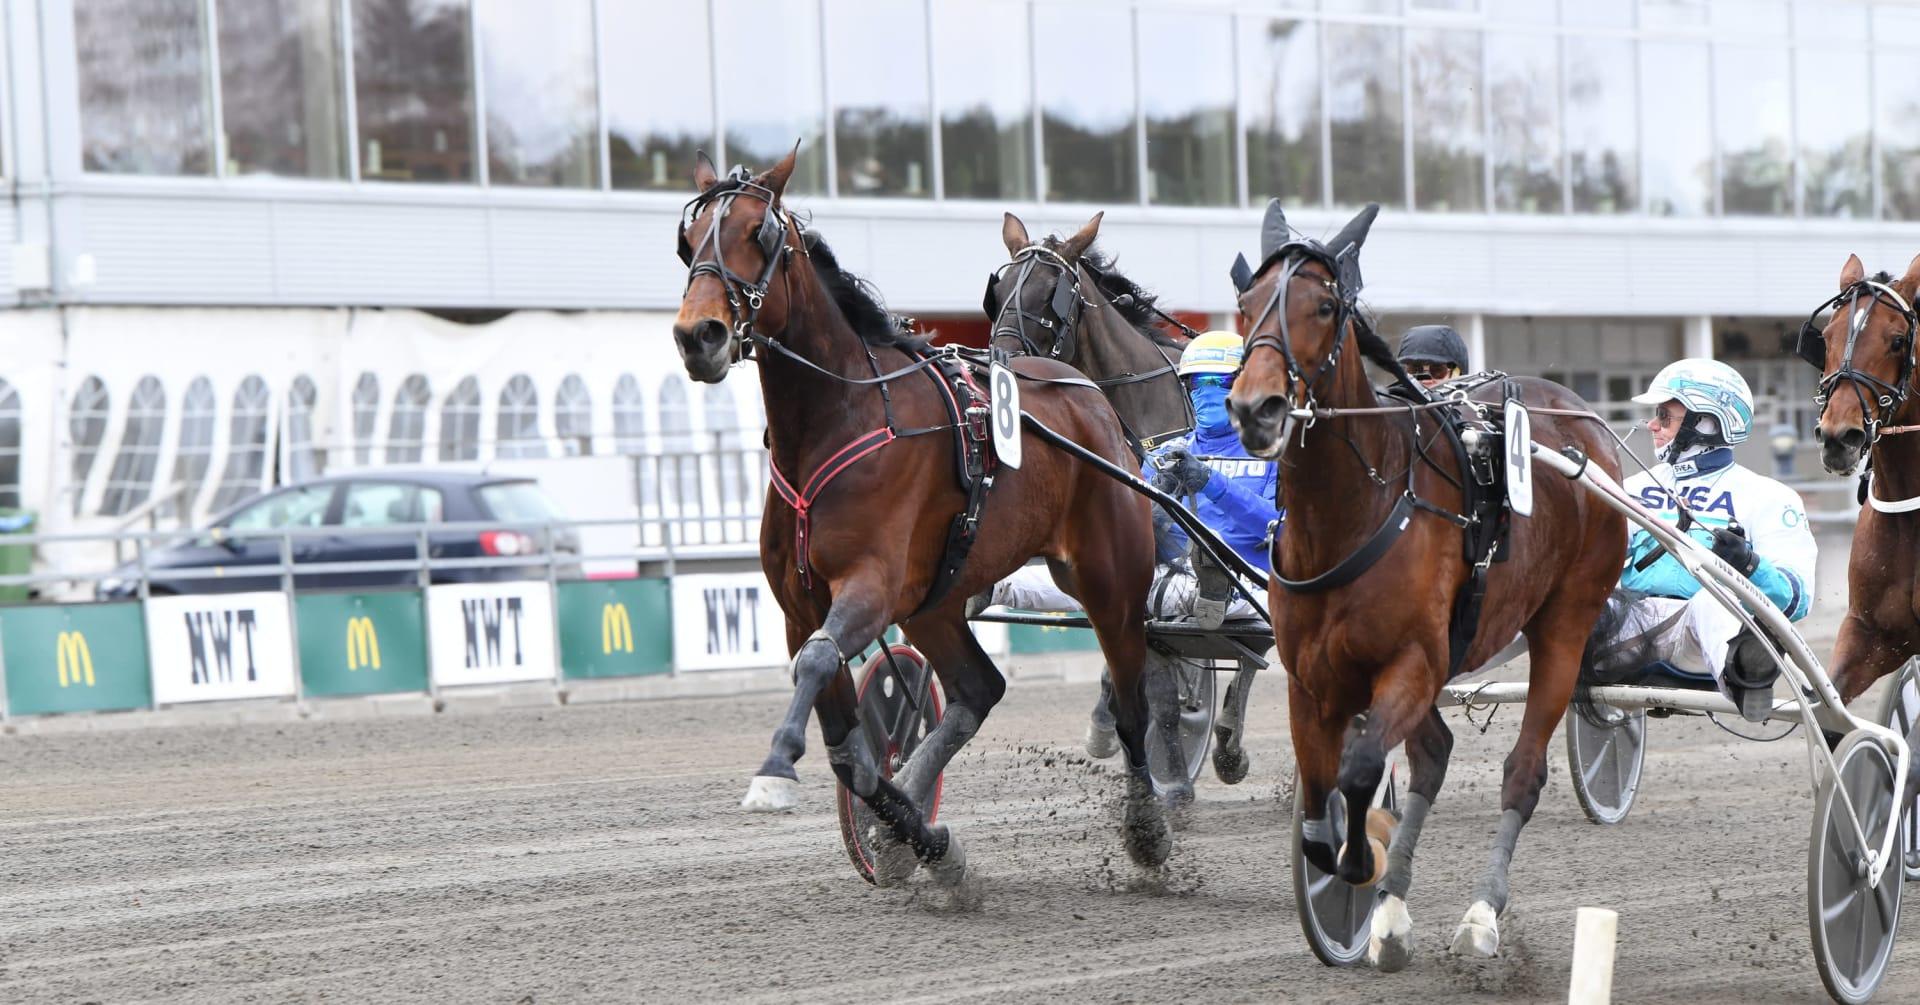 Gina Mearas vann Folke Hjalmarssons Minneslopp